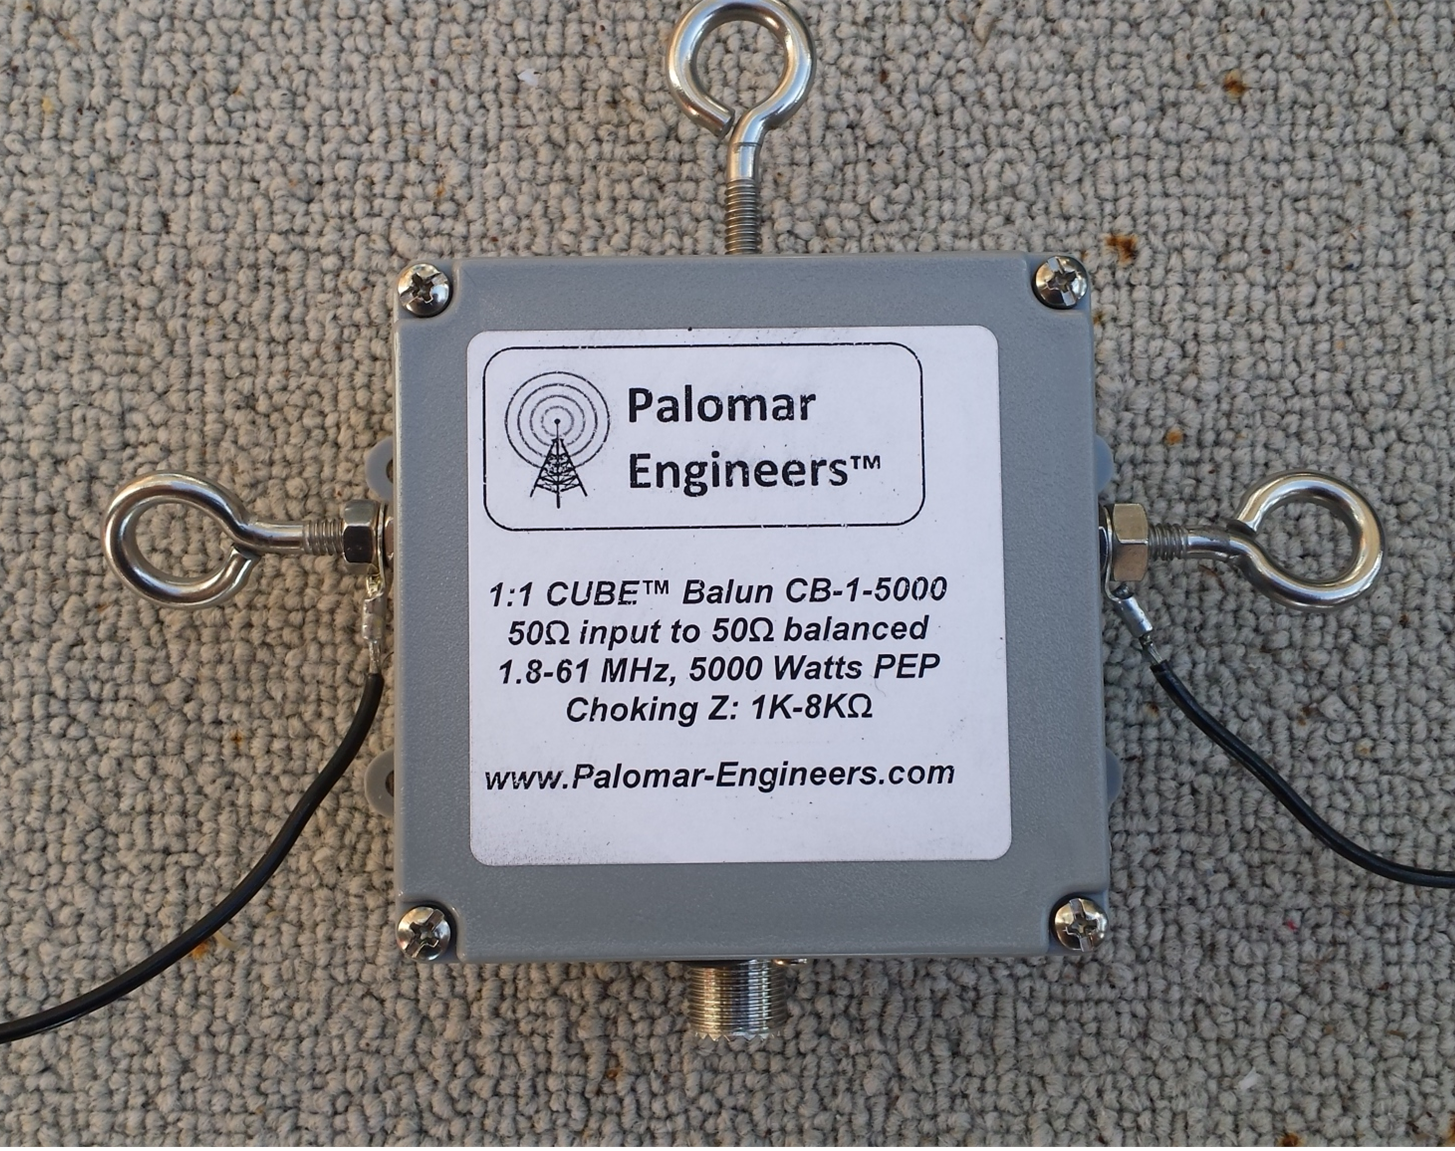 CUBE Feed Line Choke Balun, 1.5KW, 1.8-61 MHz Eyebolt Version CB-1-1500EB